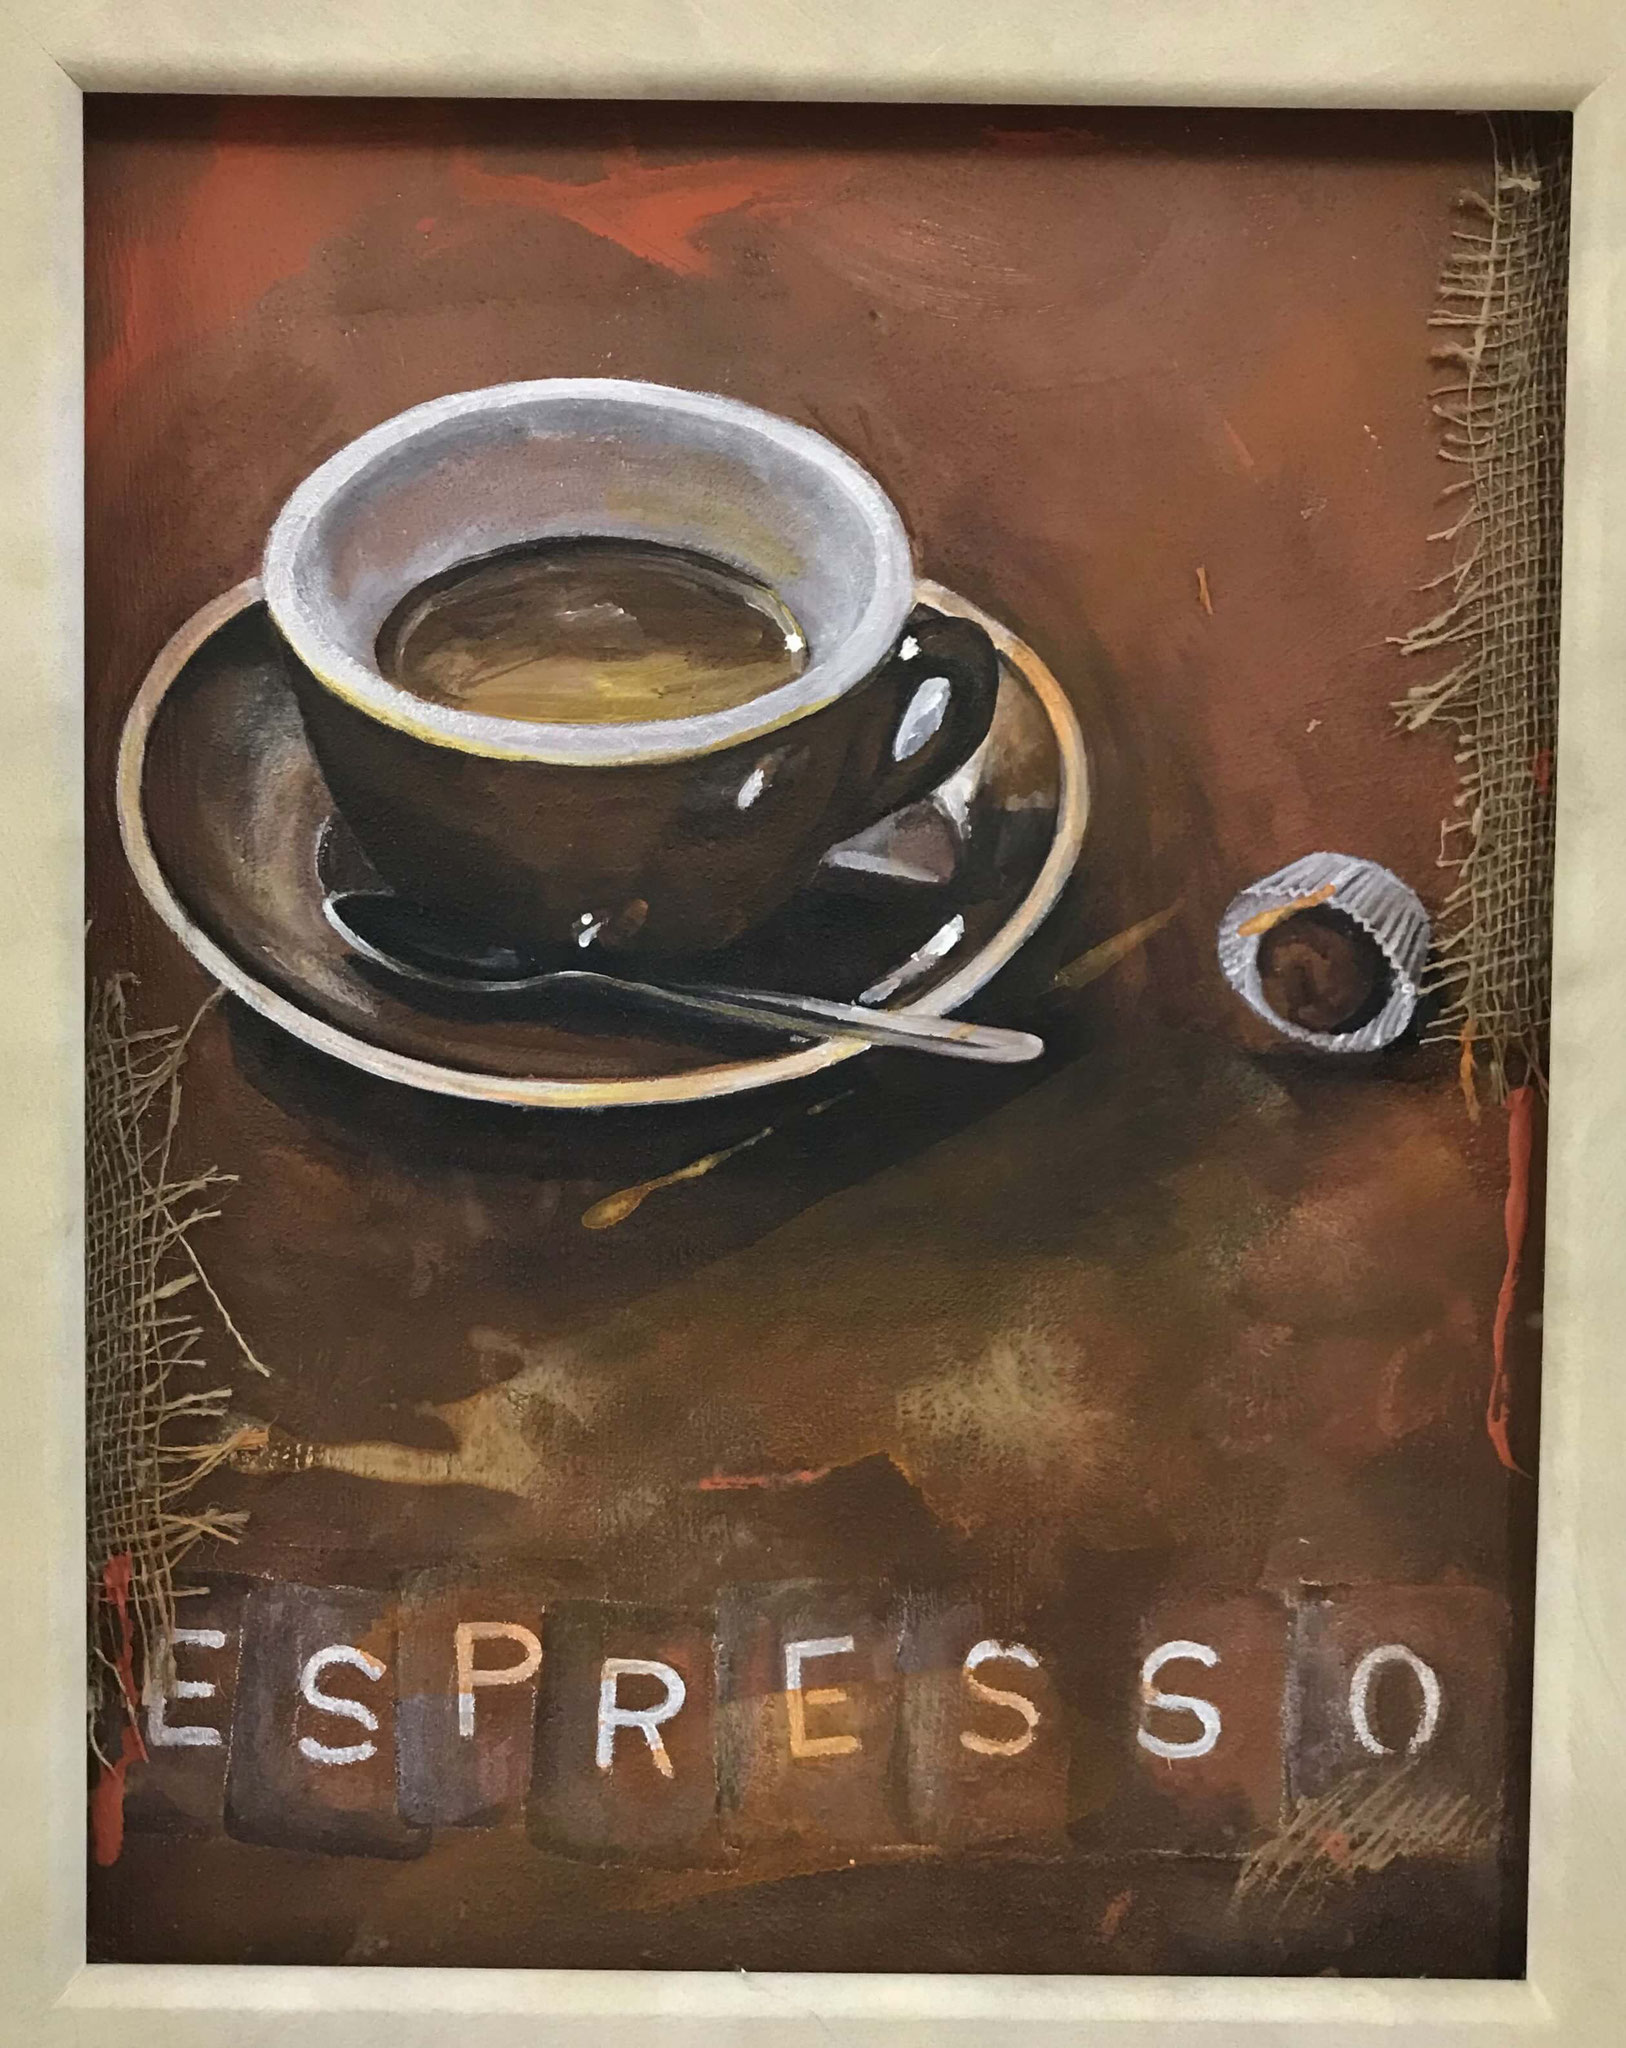 "Fr. 480.00 ""Espresso"" Acryl auf Leinwand mit Rahmen 40 x 60 cm."